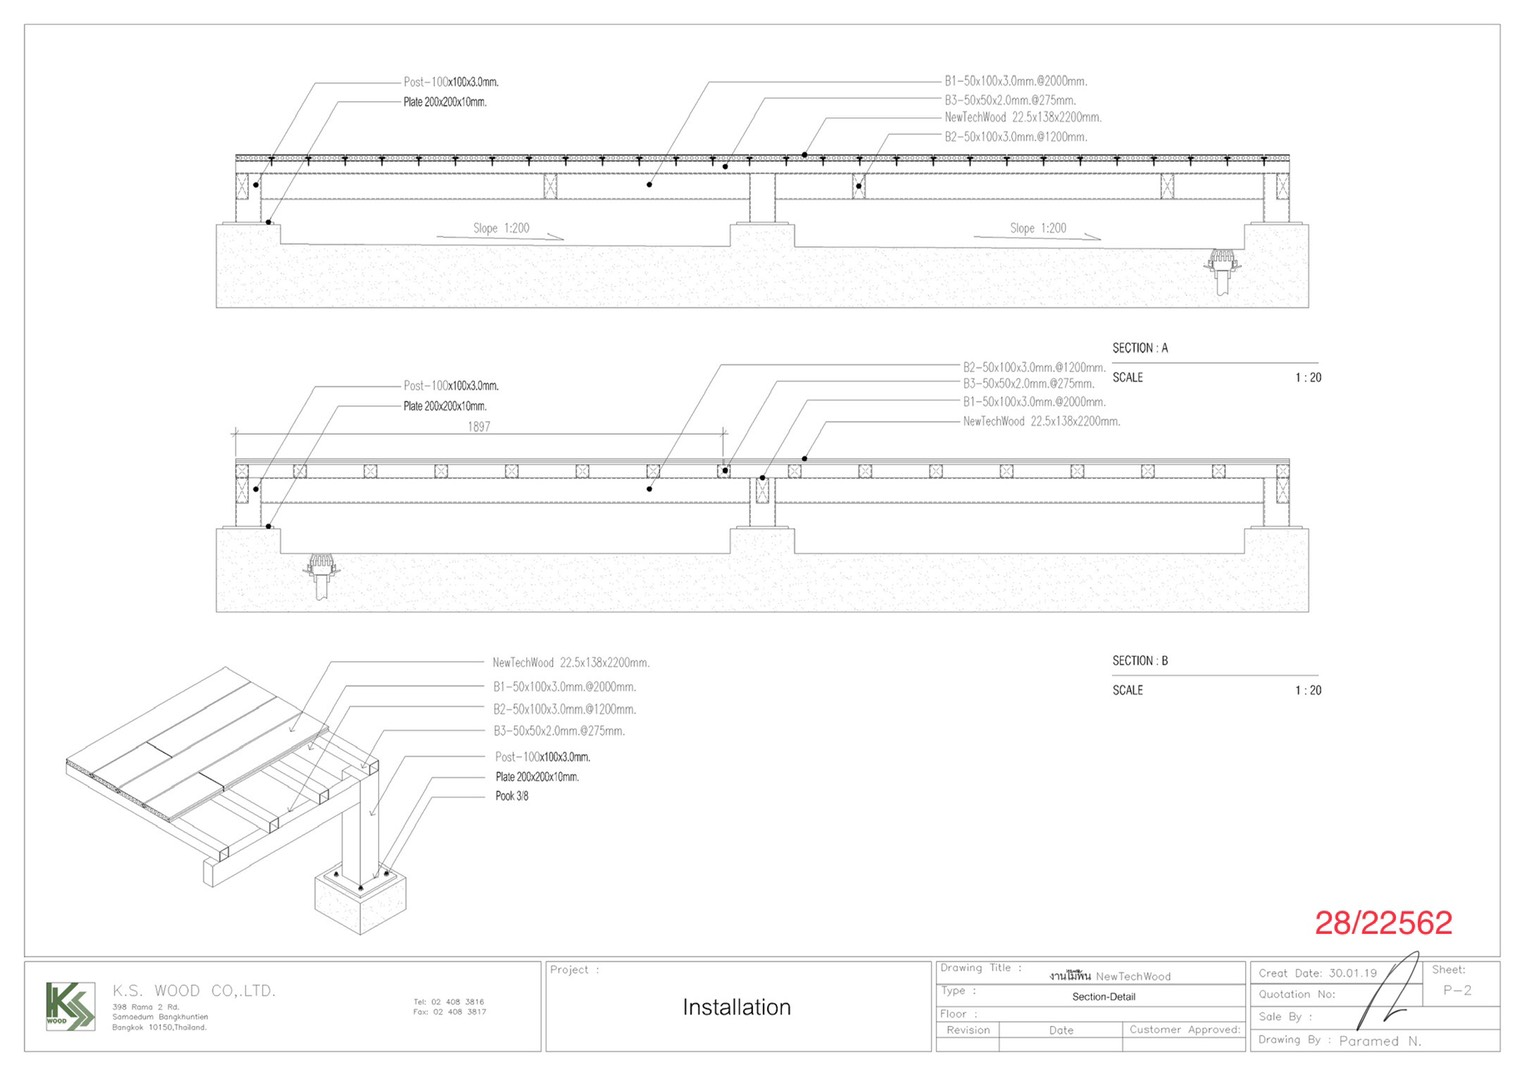 Decking Installation การติดตั้งแบบยกระดับพื้น